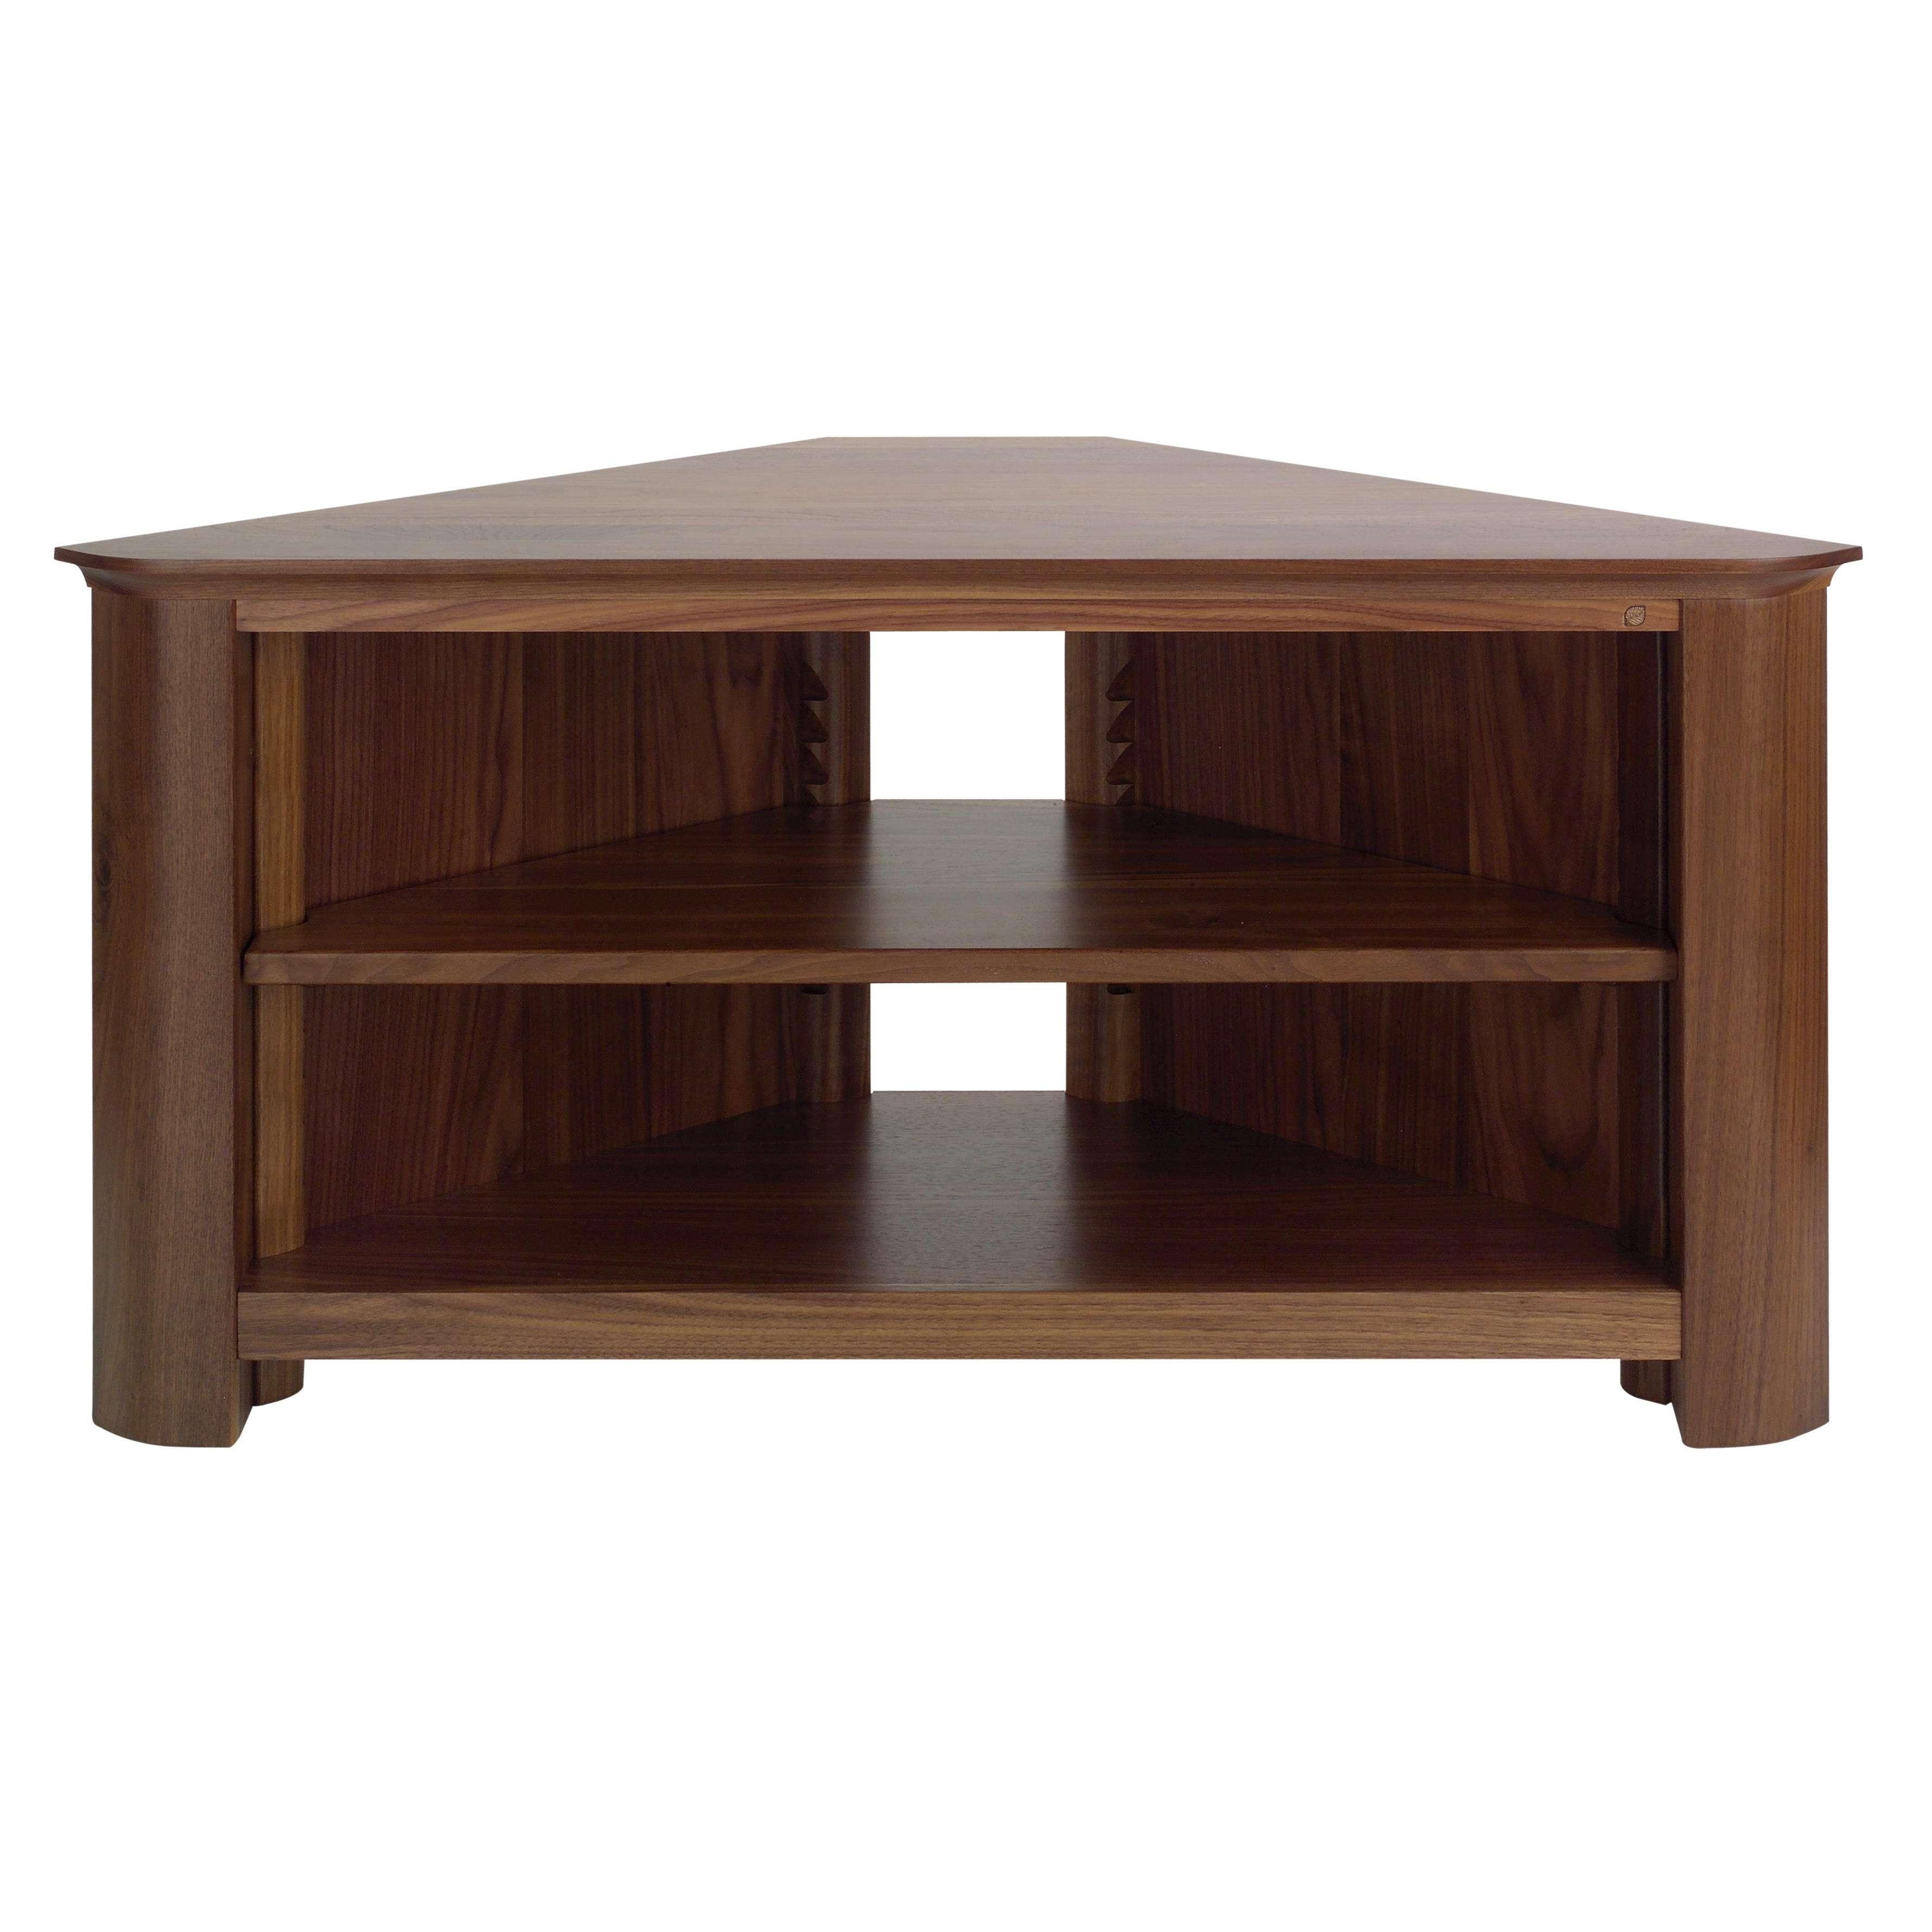 Furniture. Spacious Corner Unit Tv Stands Design (View 6 of 15)